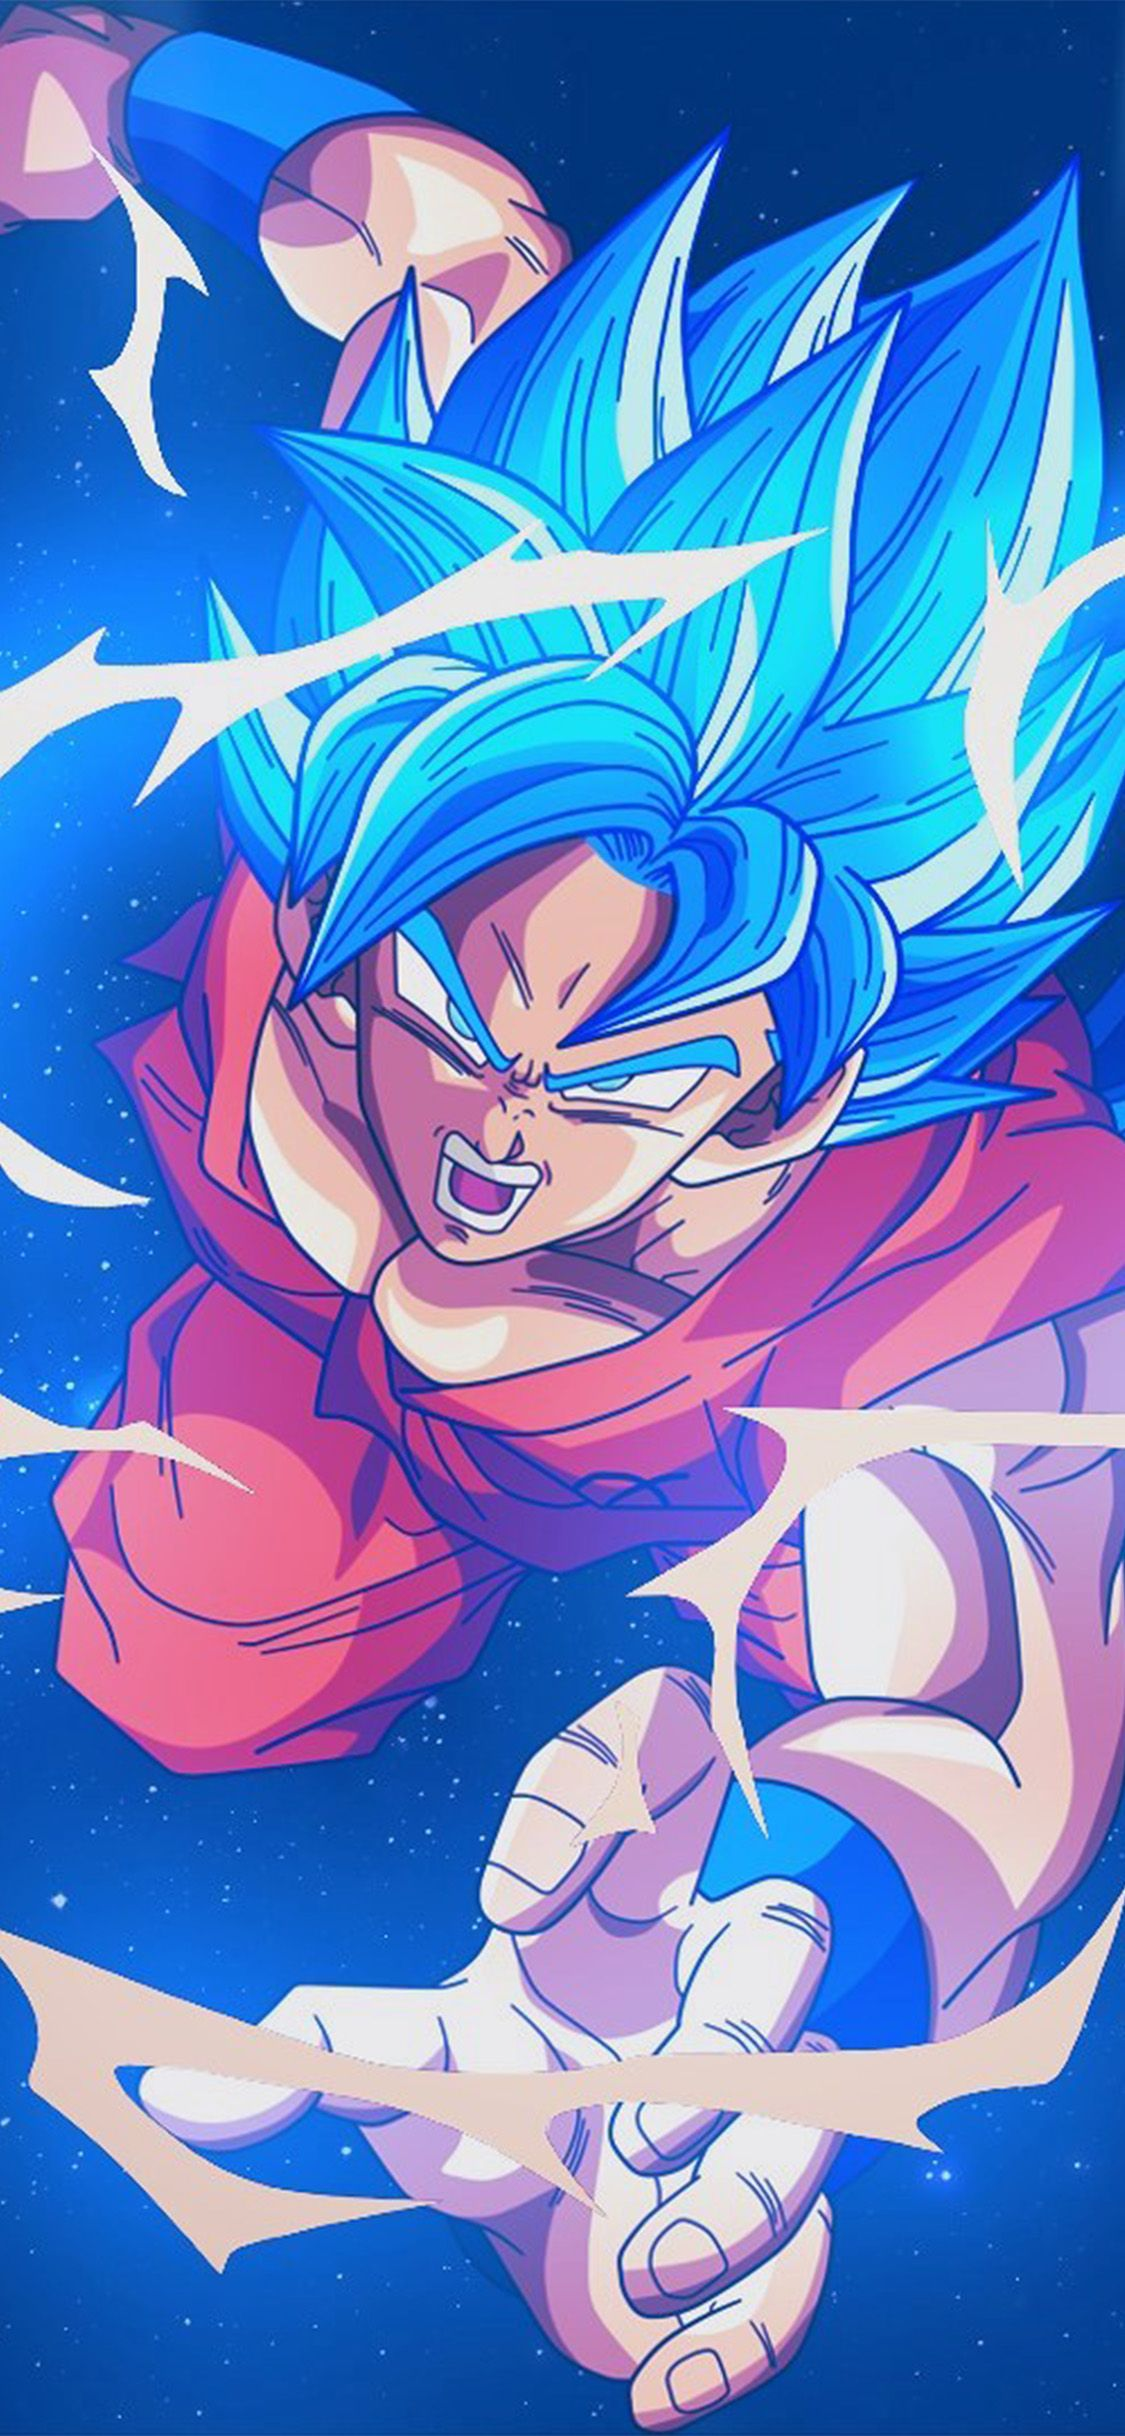 Bc54 Dragonball Goku Blue Art Illustration Anime Via Http Iphonexpapers Com Wallpapers Dragon Ball Wallpaper Iphone Dragon Ball Goku Dragon Ball Wallpapers